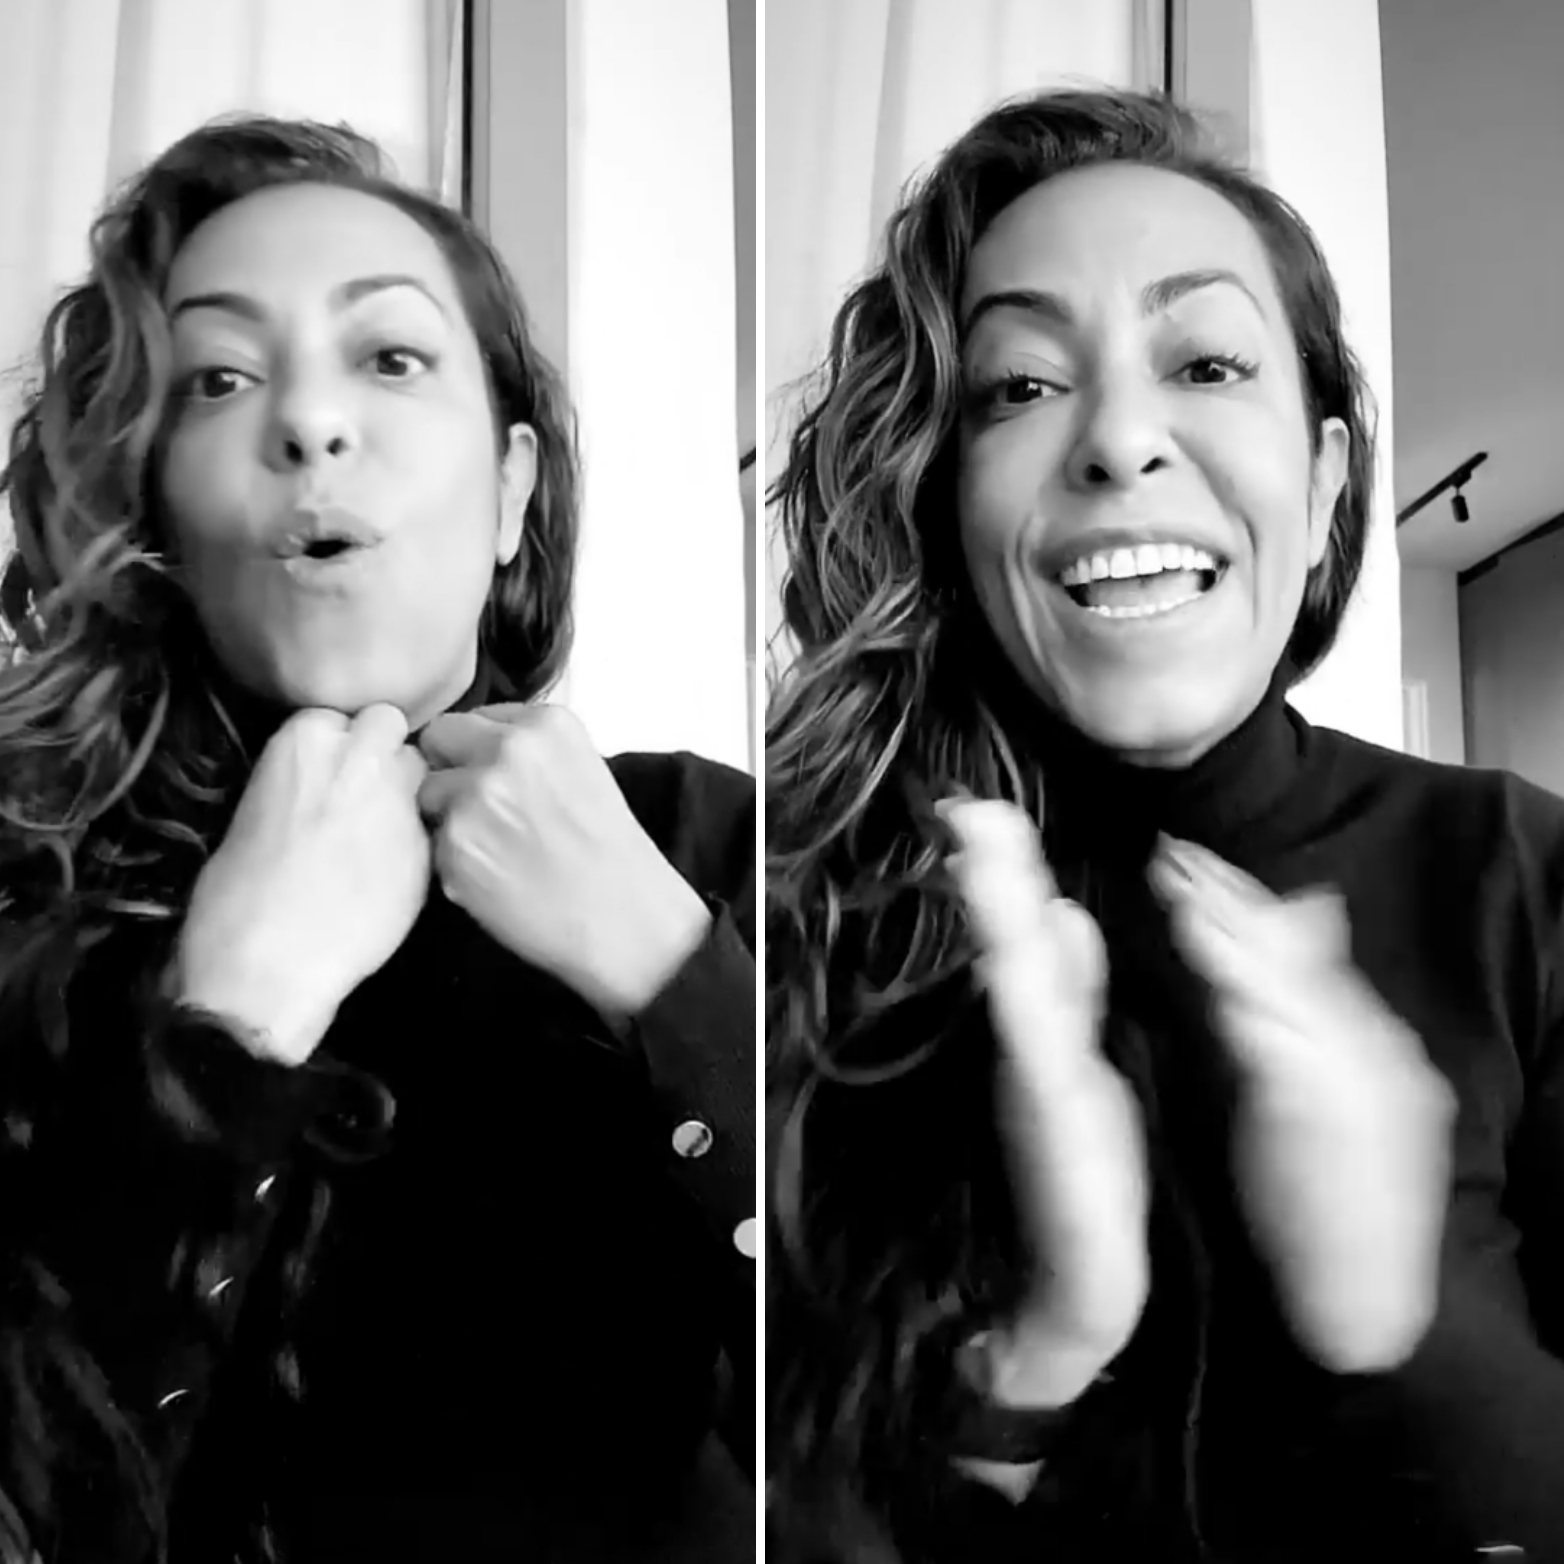 Samantha Schmützmanda indireta para Marina Ruy Barbosa